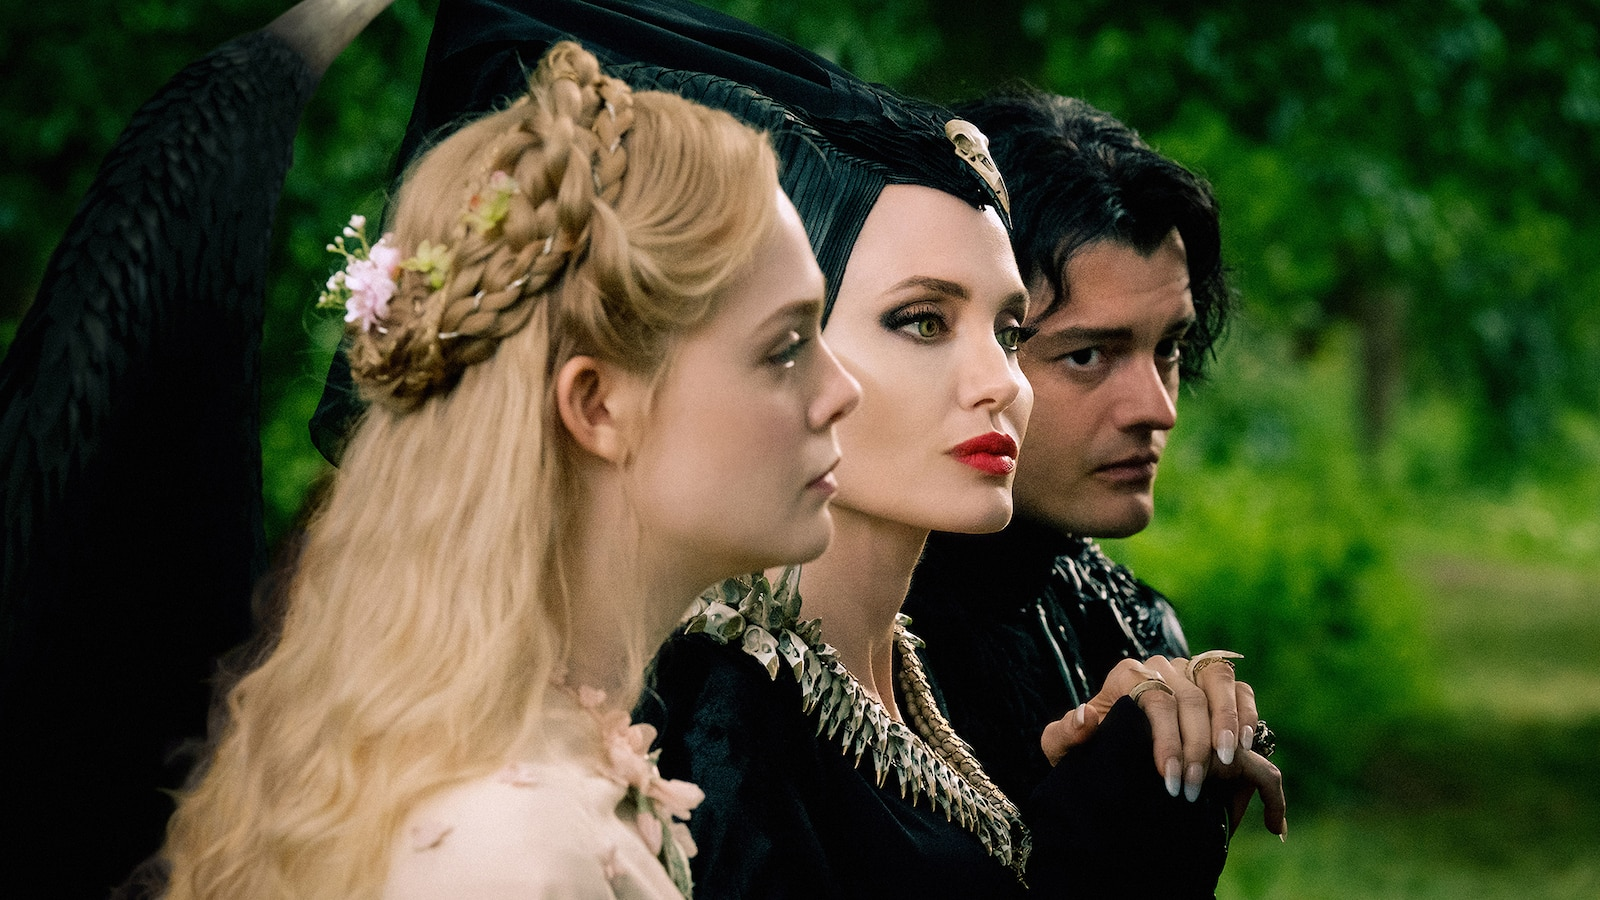 maleficent-2-ondskans-harskarinna-kop-2019